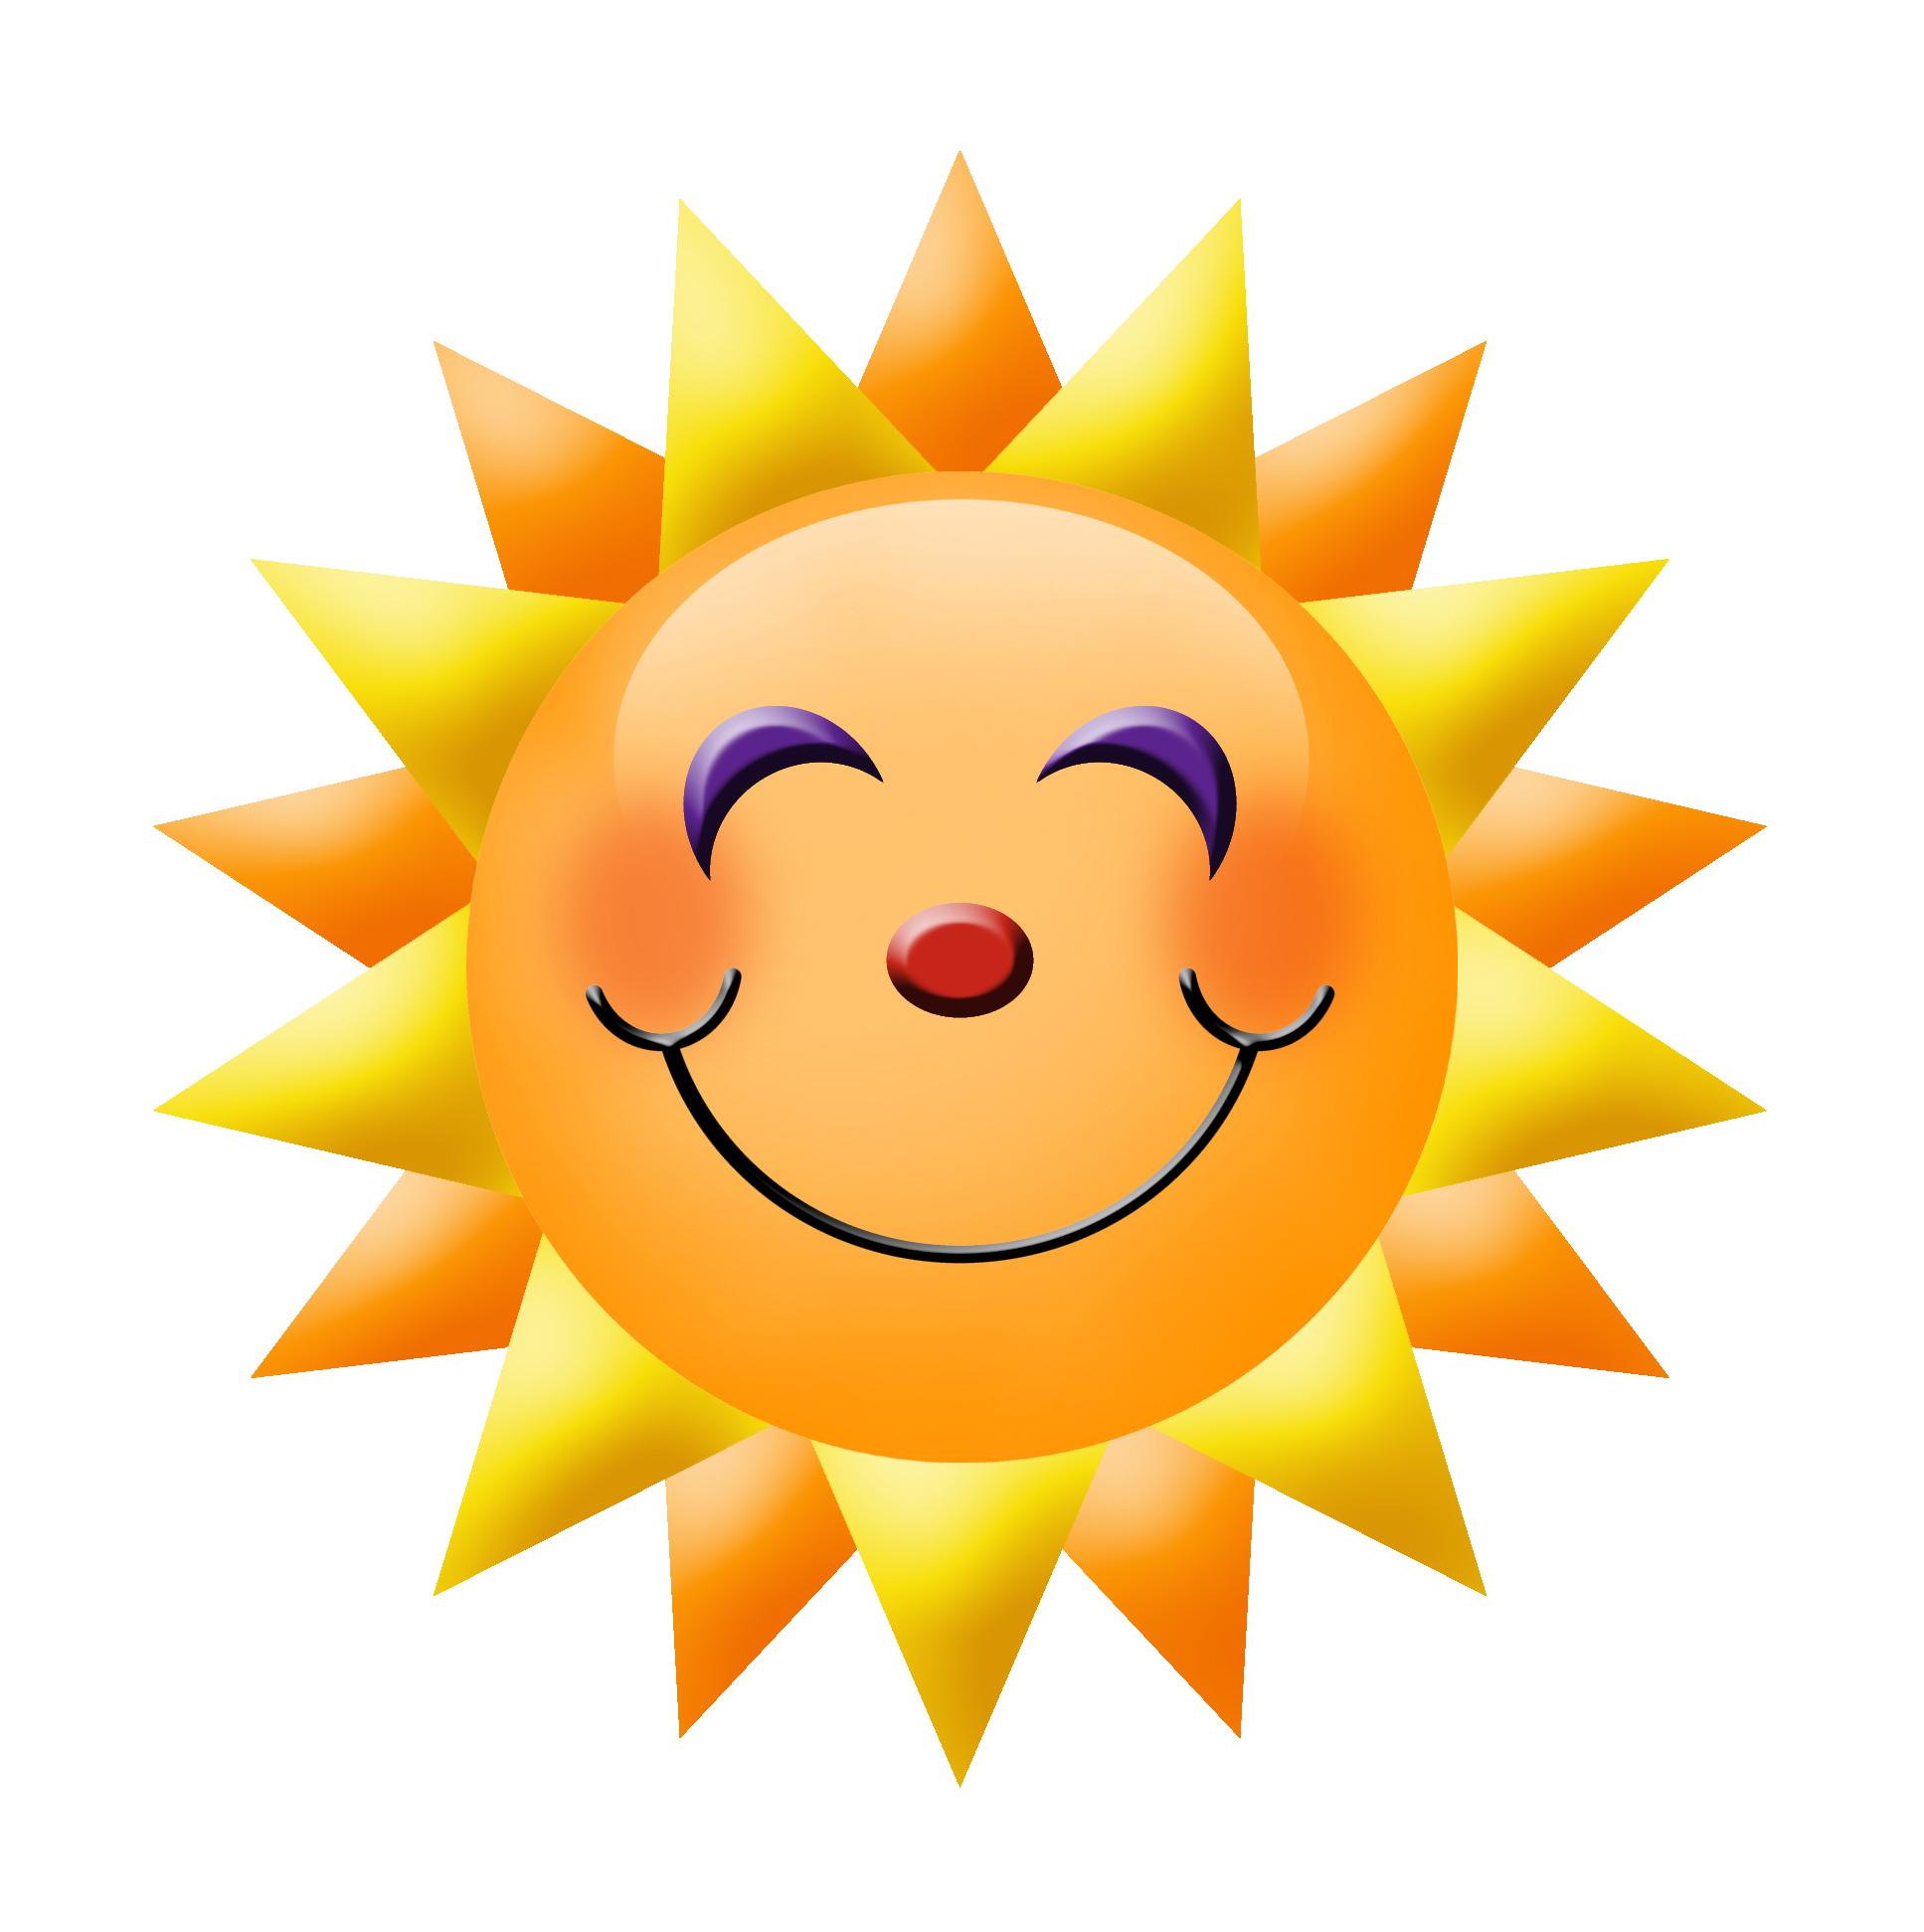 Happy Face Sun - ClipArt Best